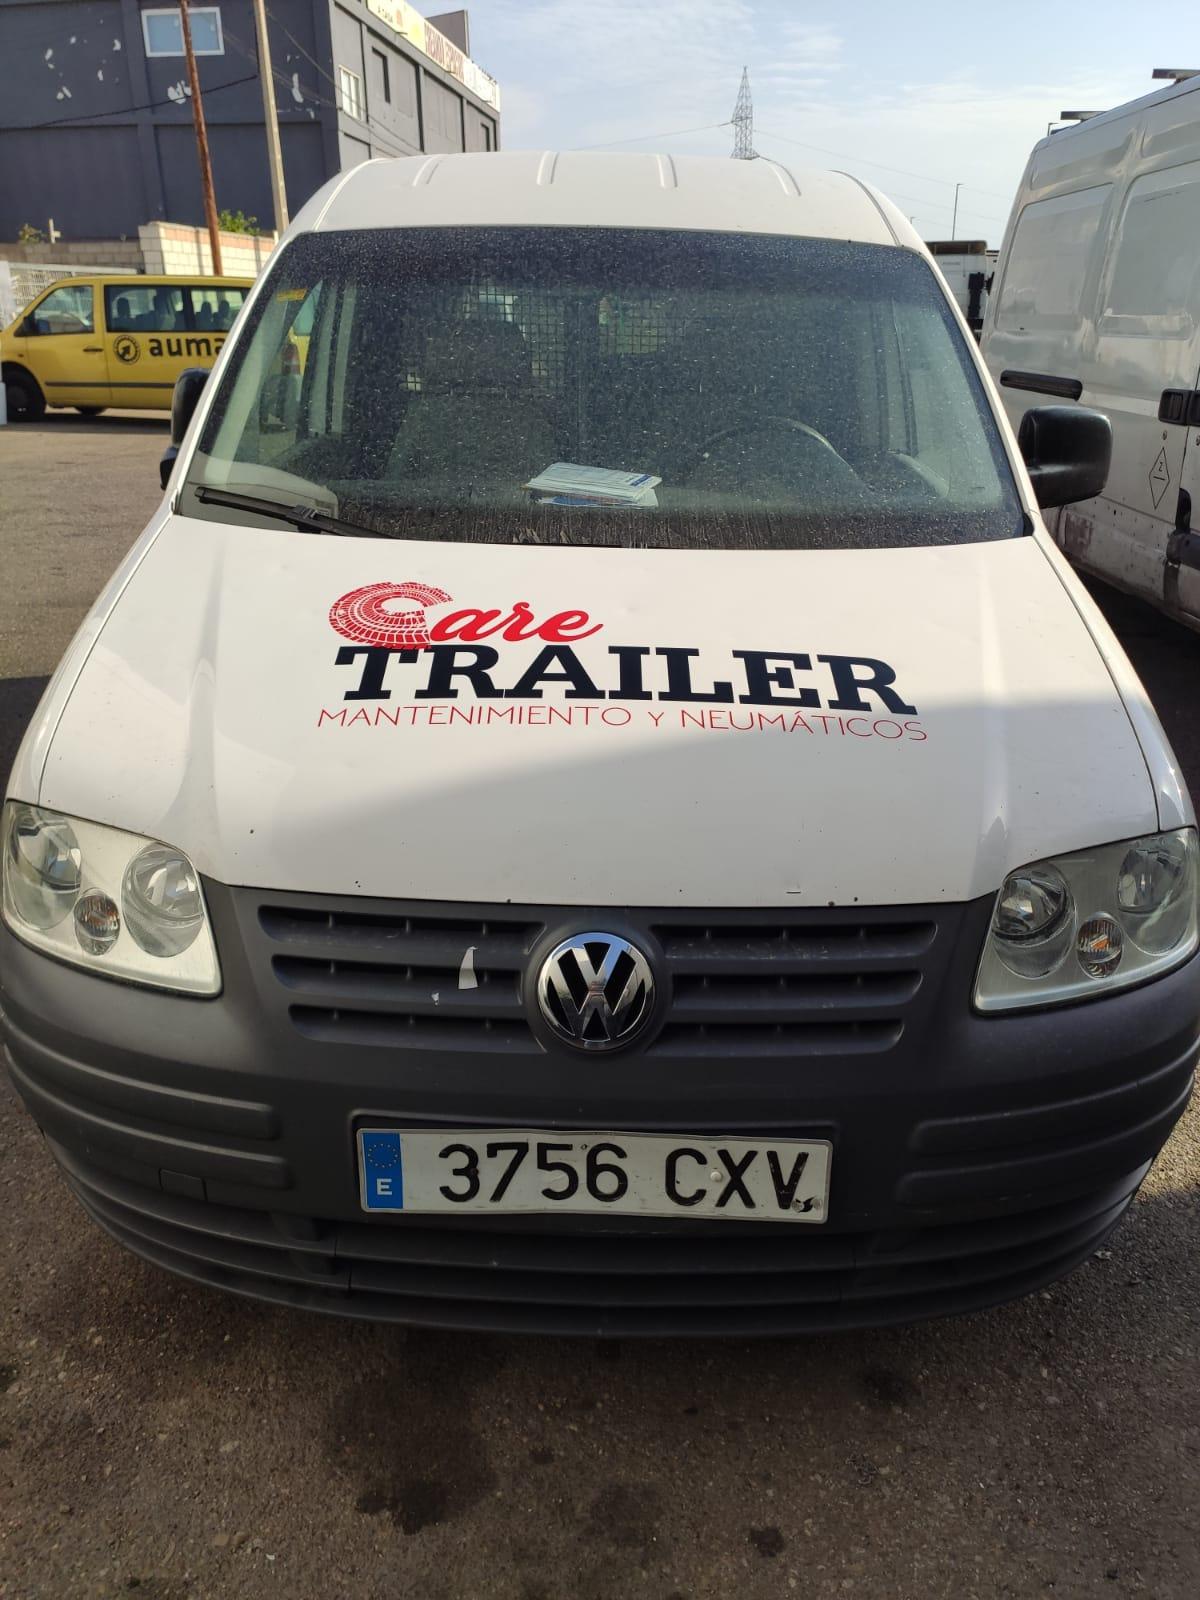 Caretrailer rotulacion furgoneta 2